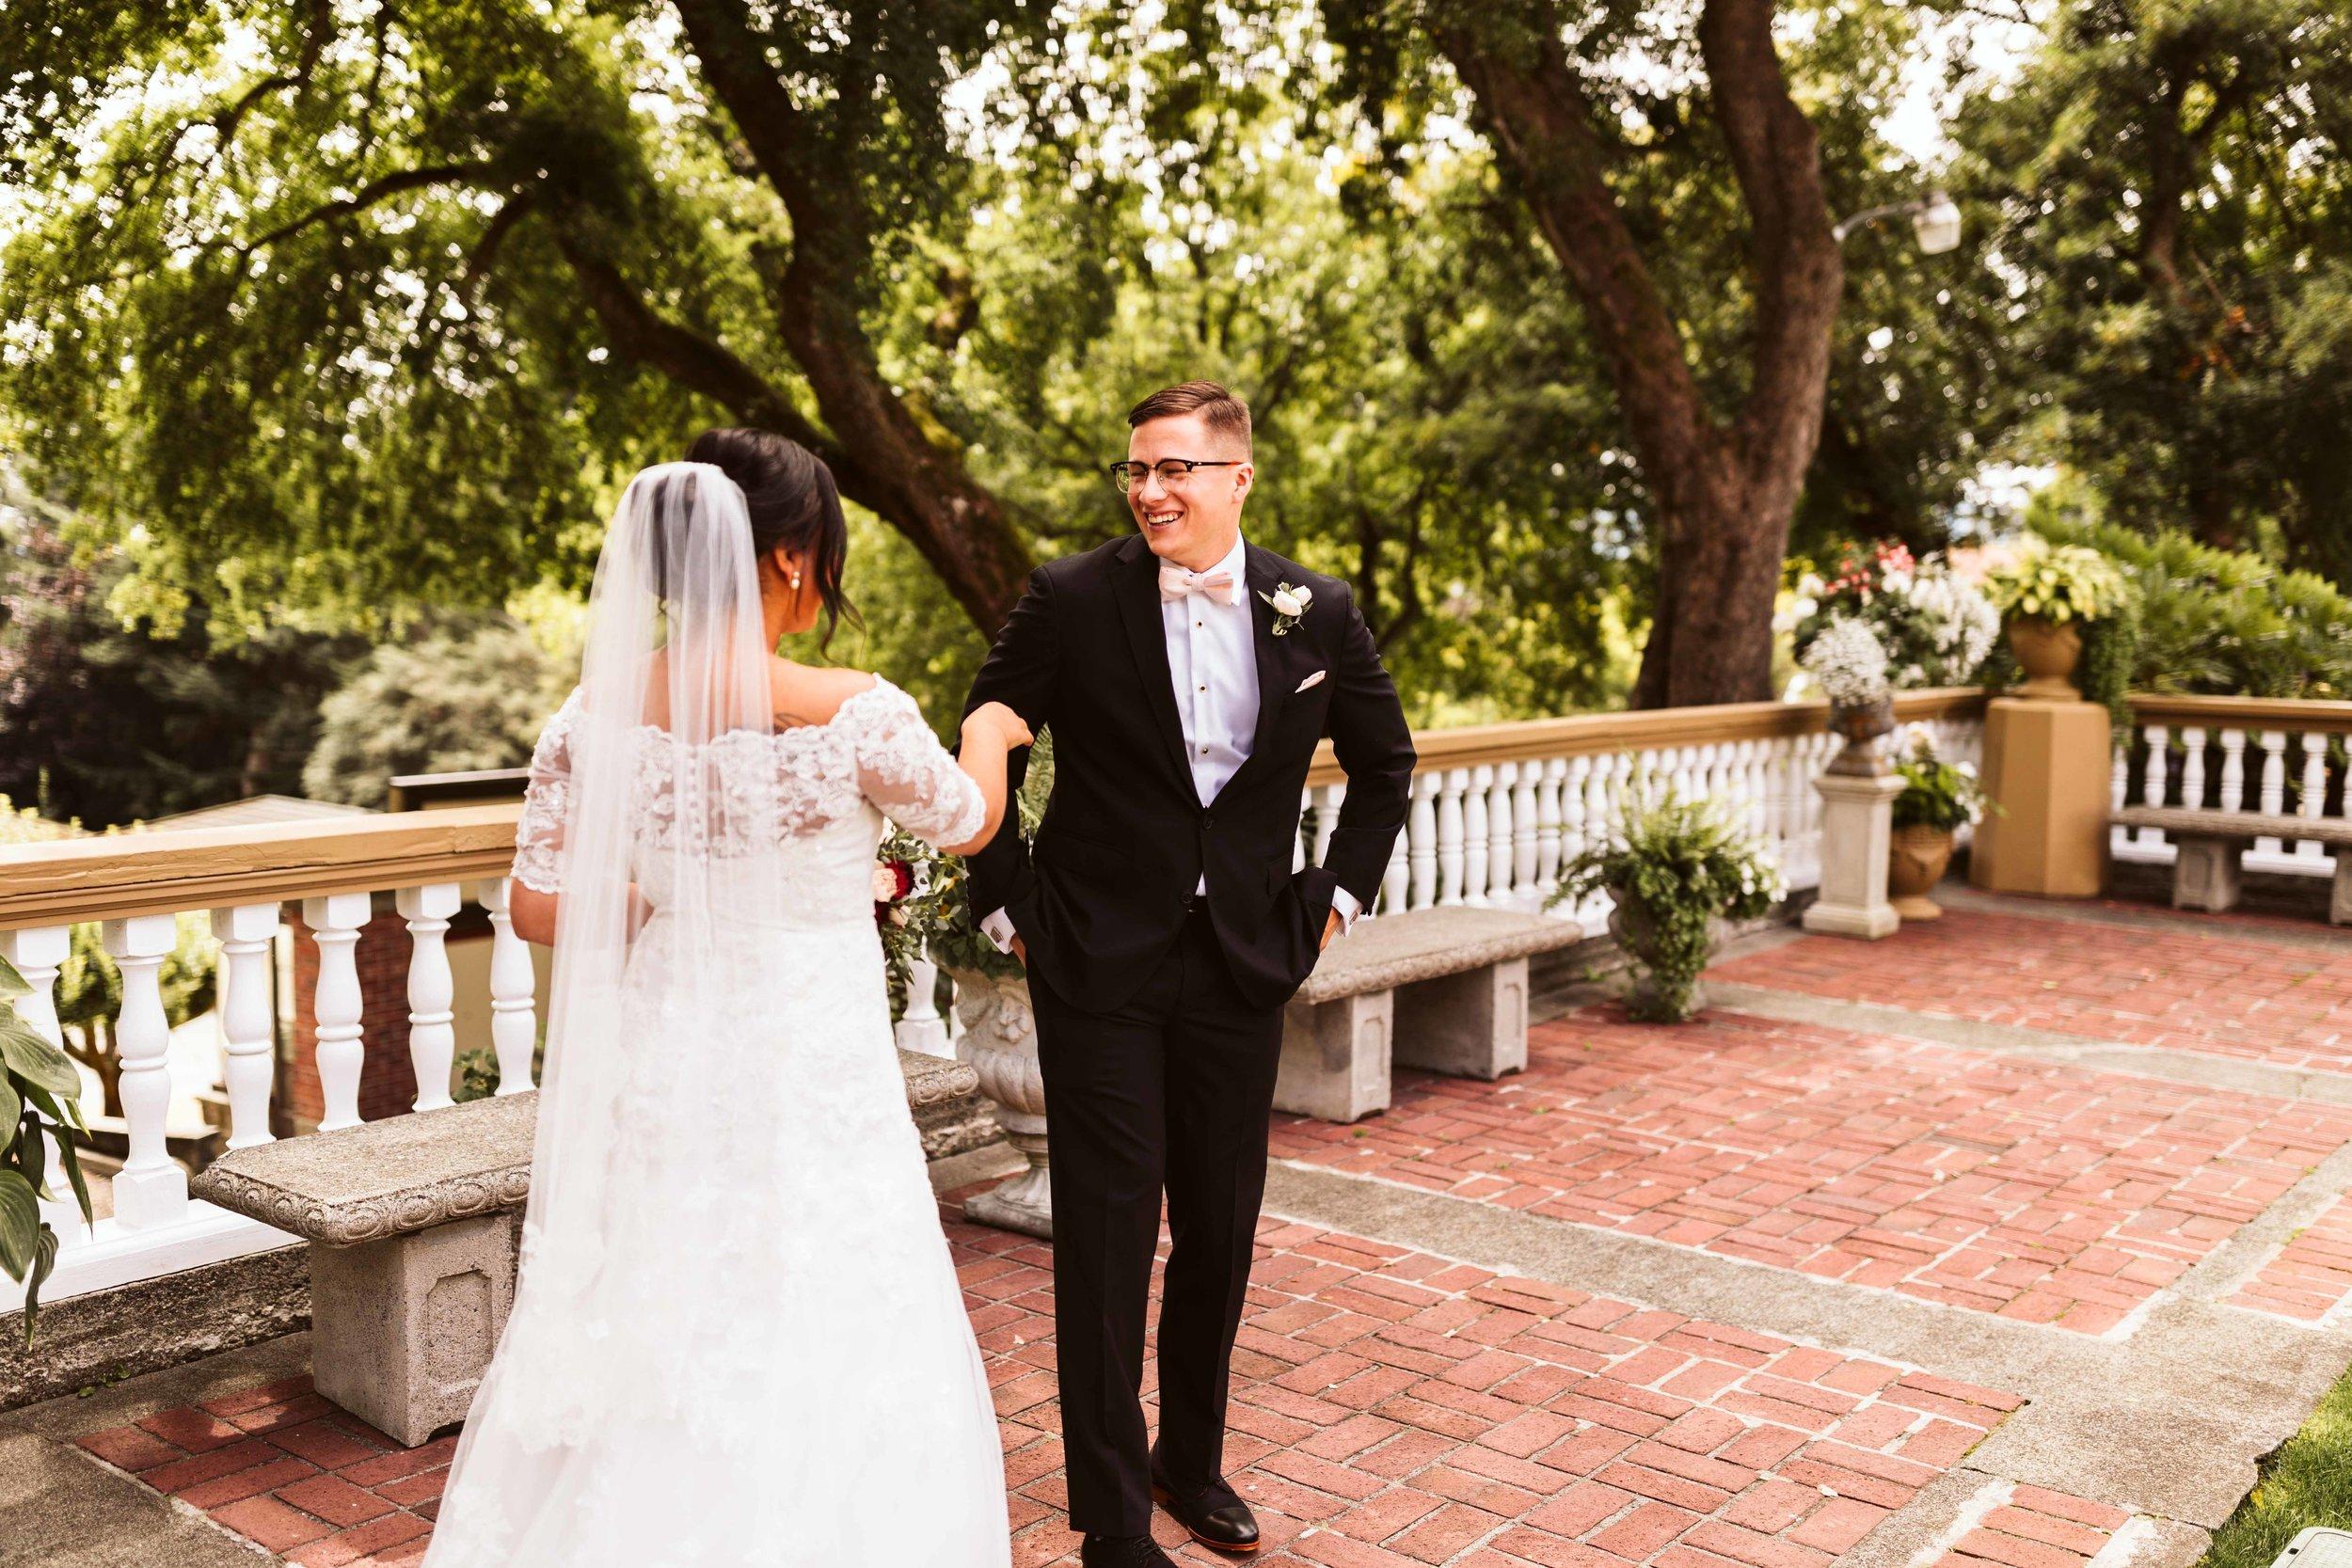 lairmont-manor-wedding-21.jpg